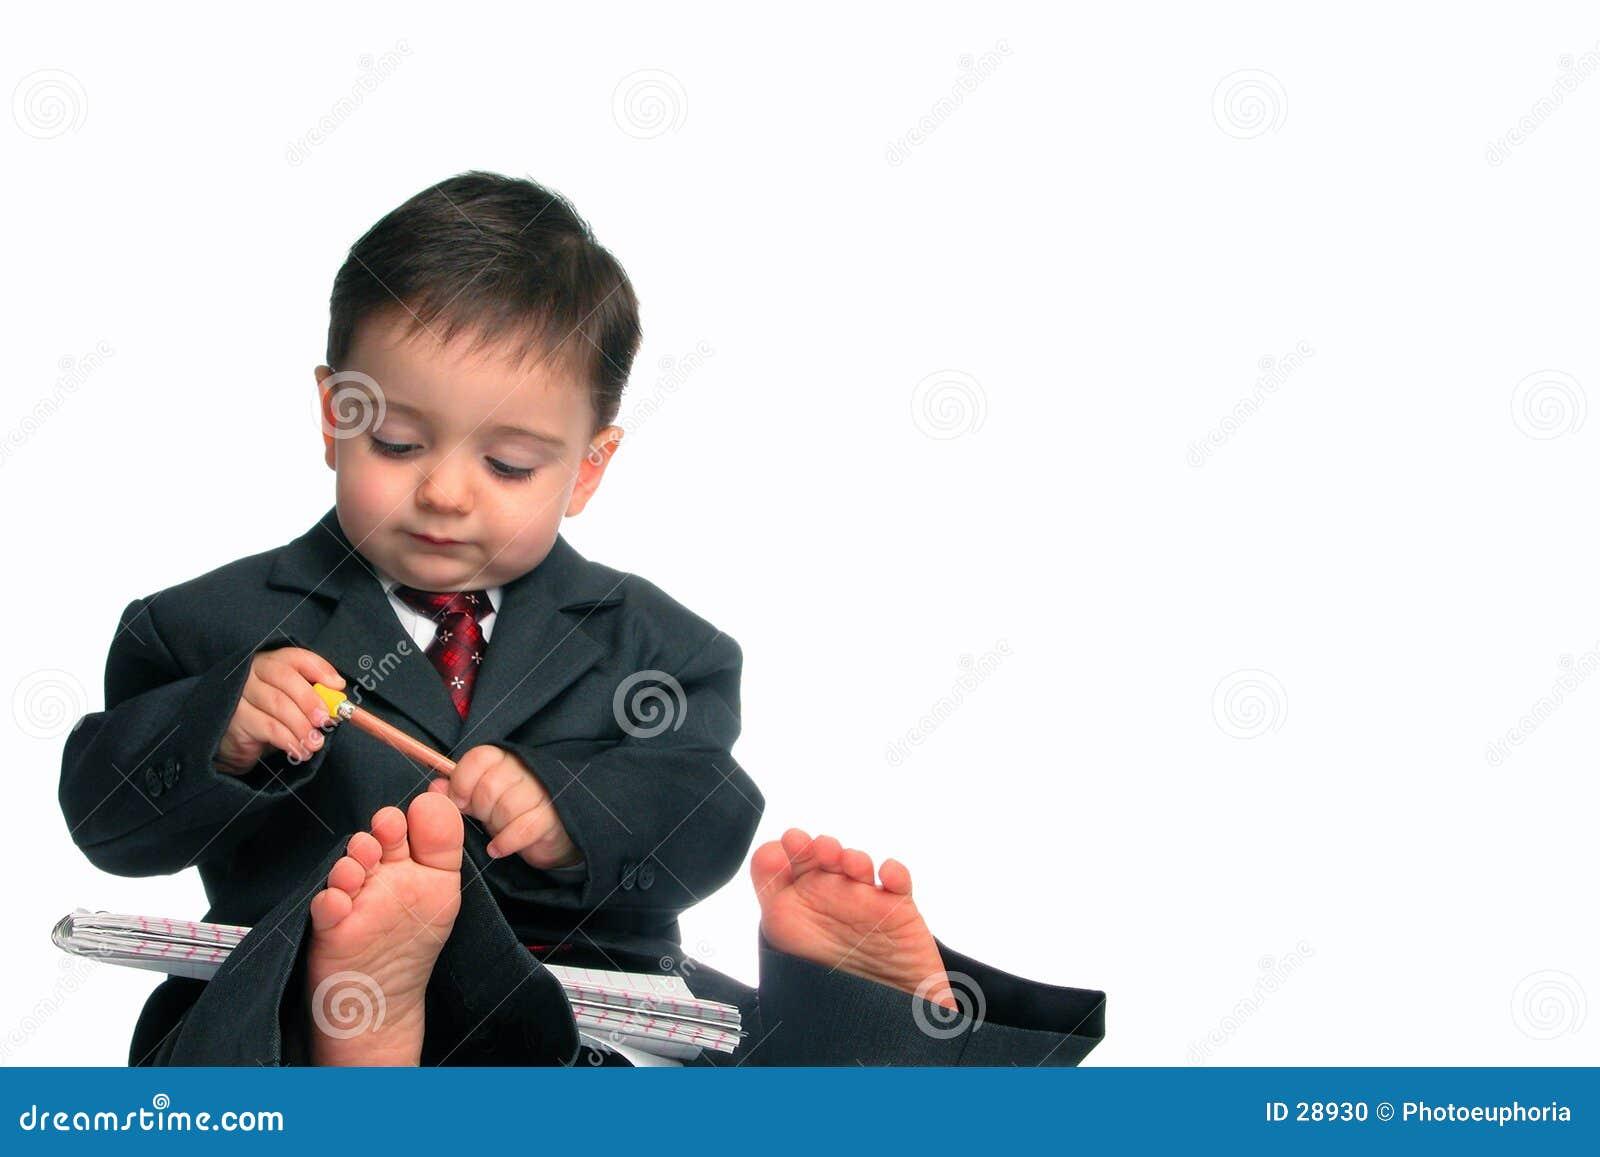 Little Man Series: Barefoot & Business (1 of 2)